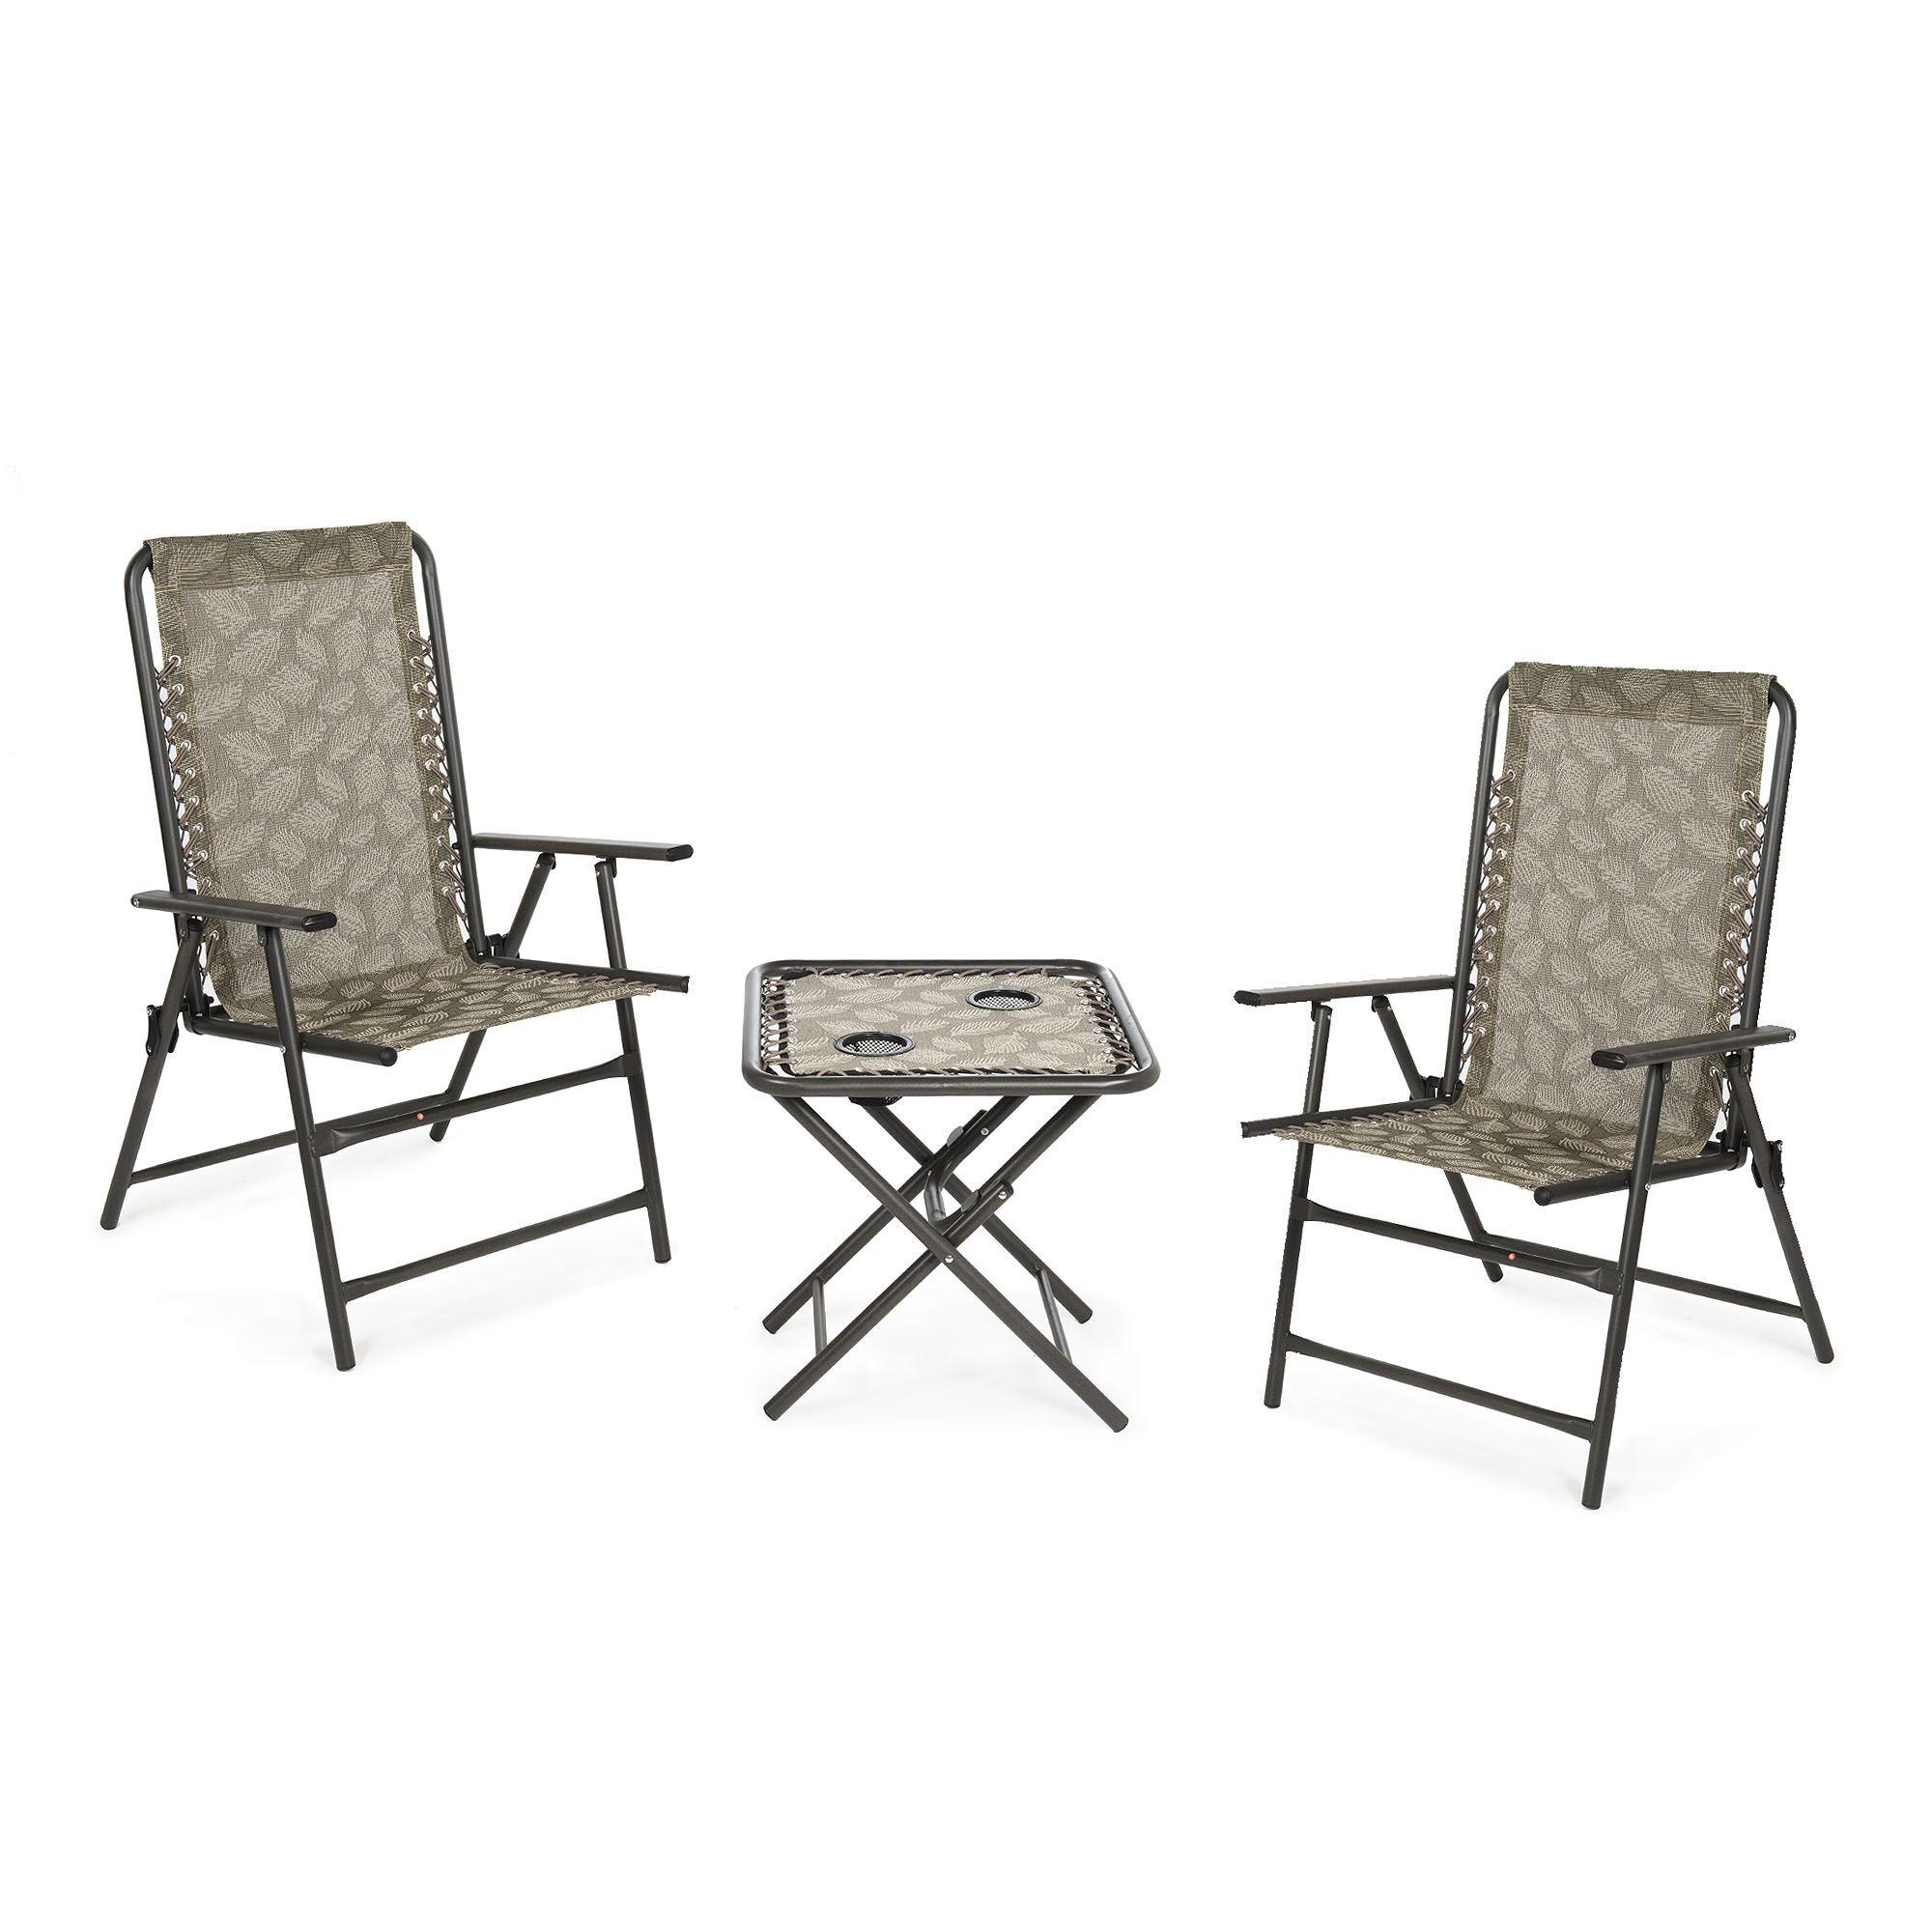 Innovators Set 2 sedie pieghevoli e tavolino con porta bicchieri (3 pz)